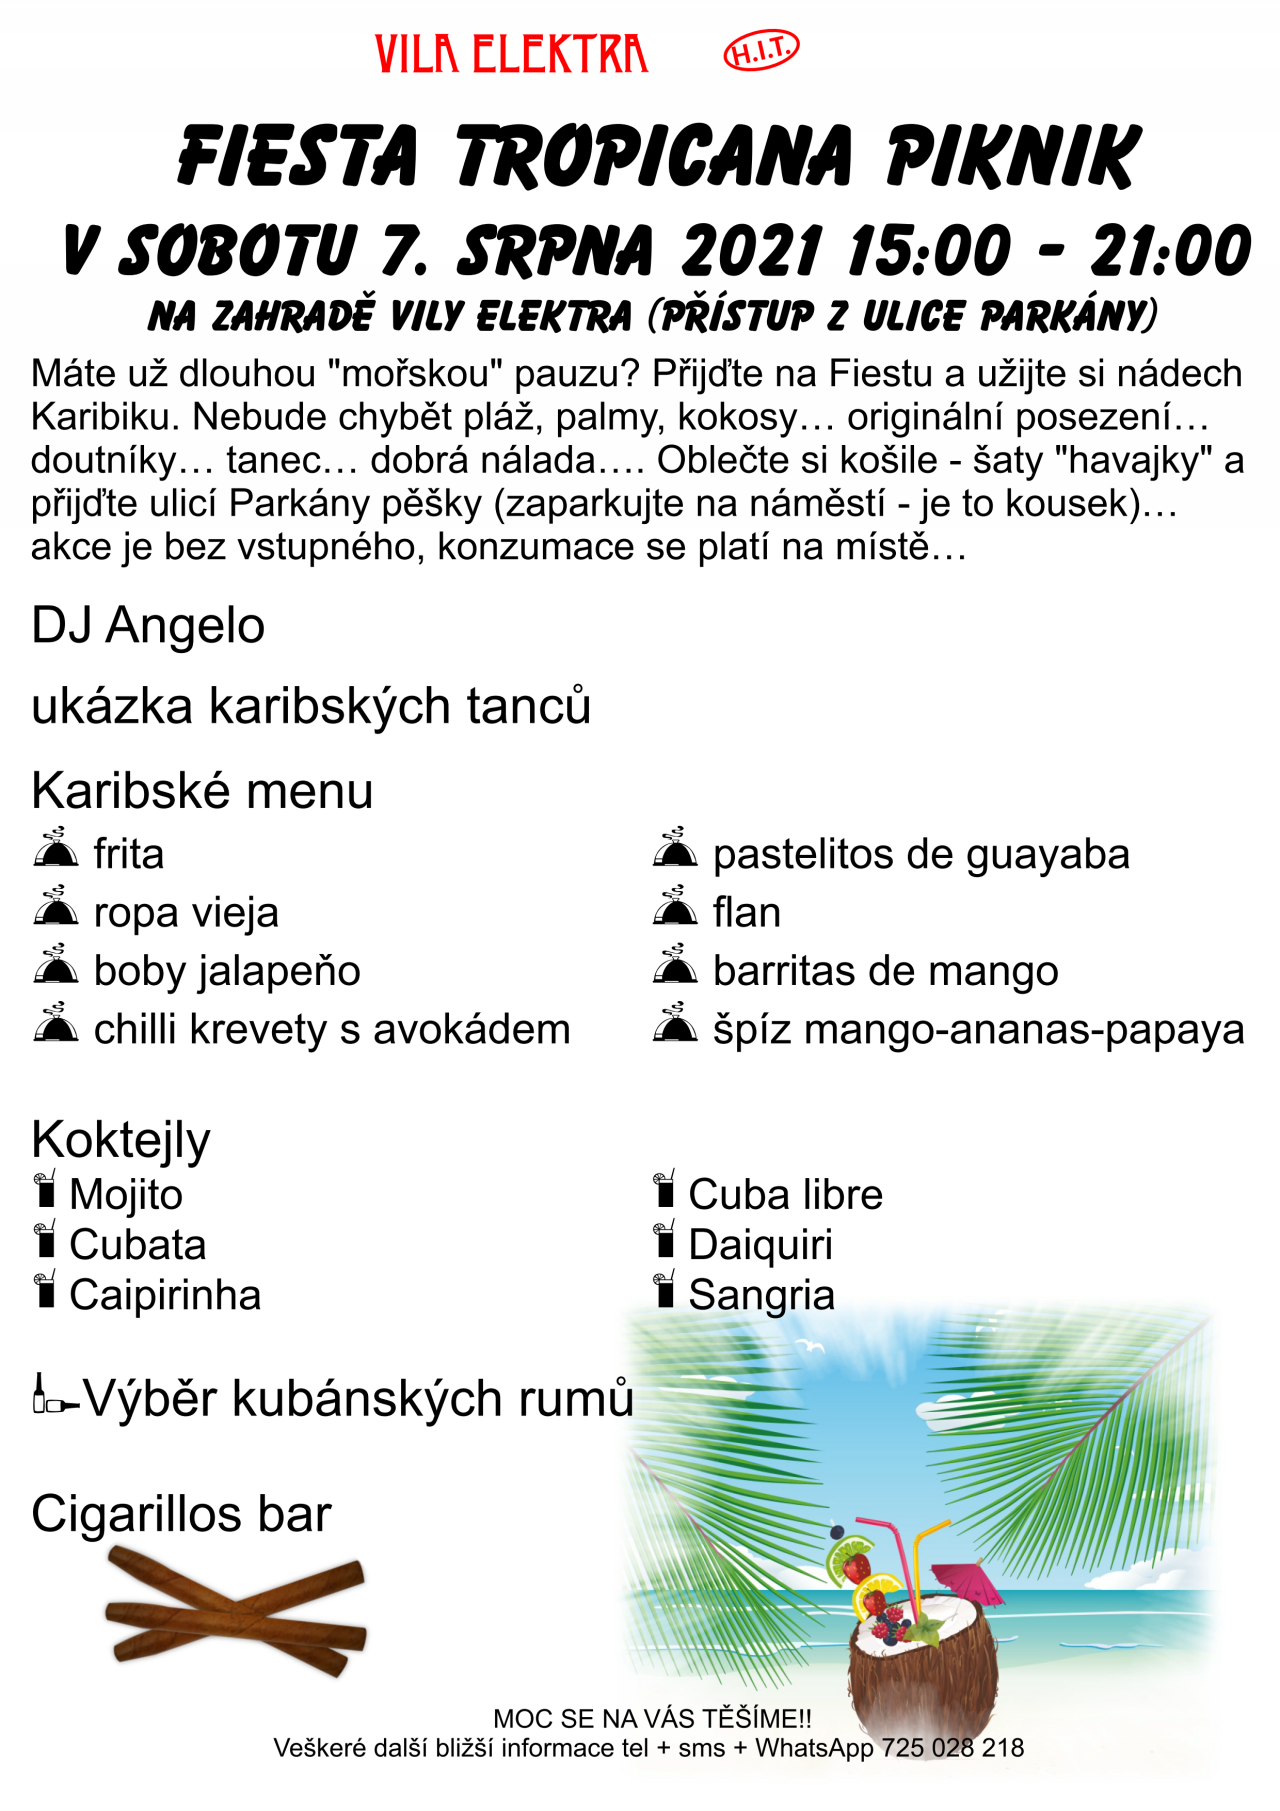 Sobota 7. 8. 2021 - Fiesta tropicana piknik